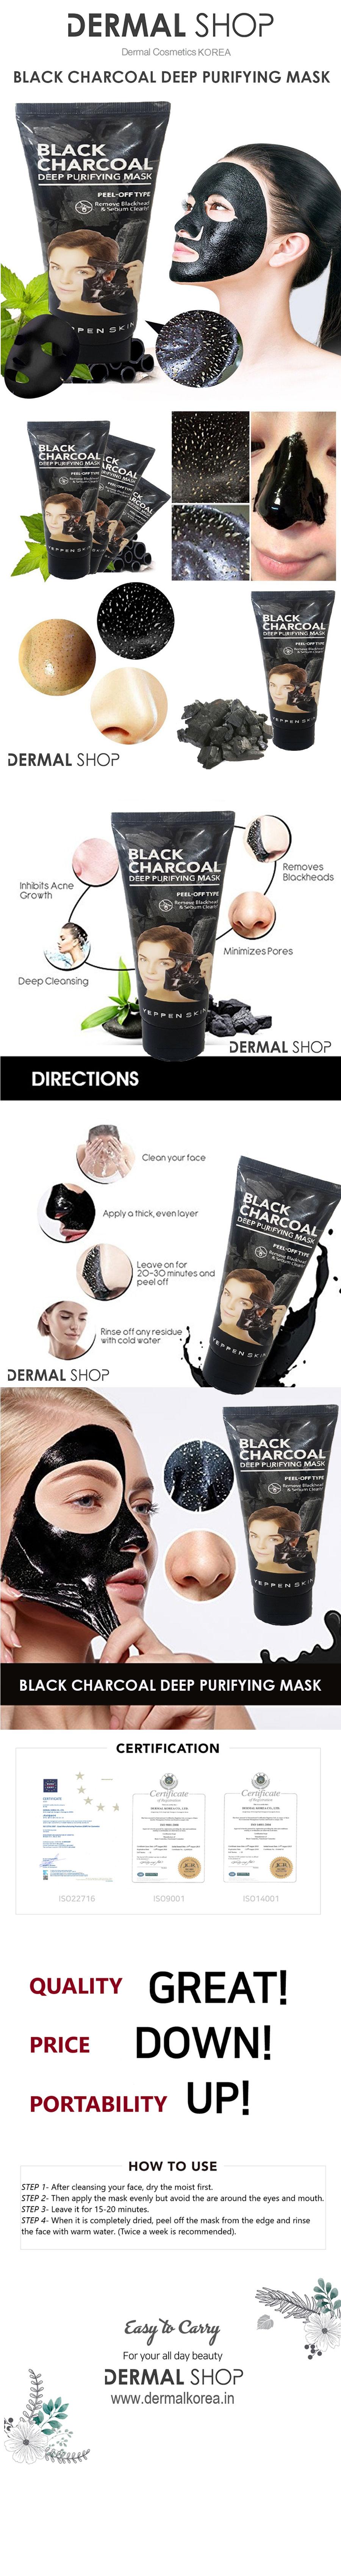 Dermal Yeppen Skin Black Charcoal Deep Purifying Mask